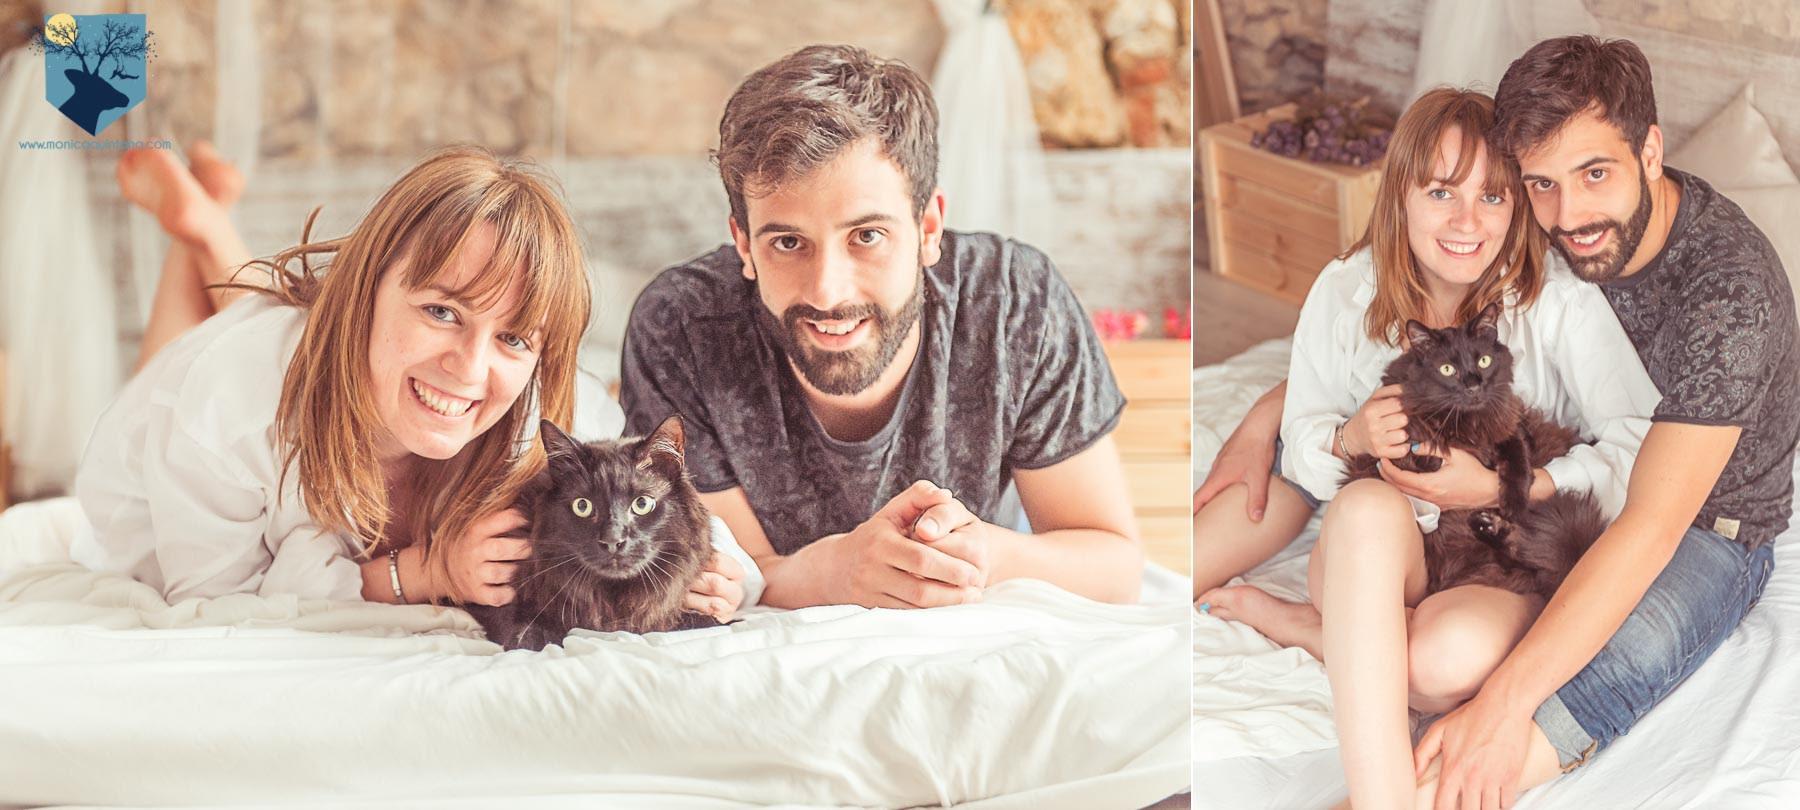 fotografia, girona, figueres, emporda, monica quintana, retrato, book, pareja, gato, estudio, lifestyle